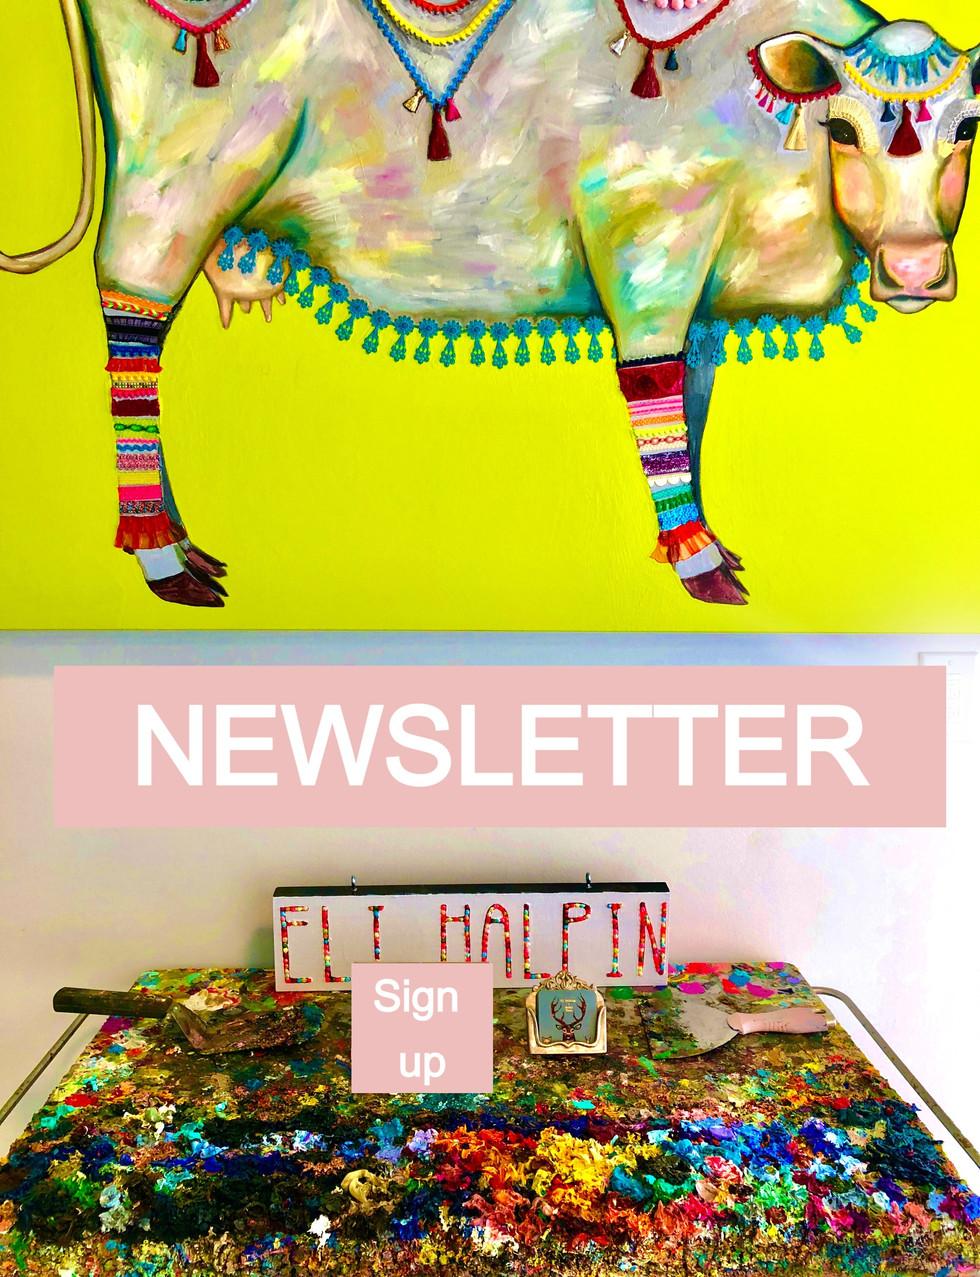 Eli Halpin's Newsletter Sign Up